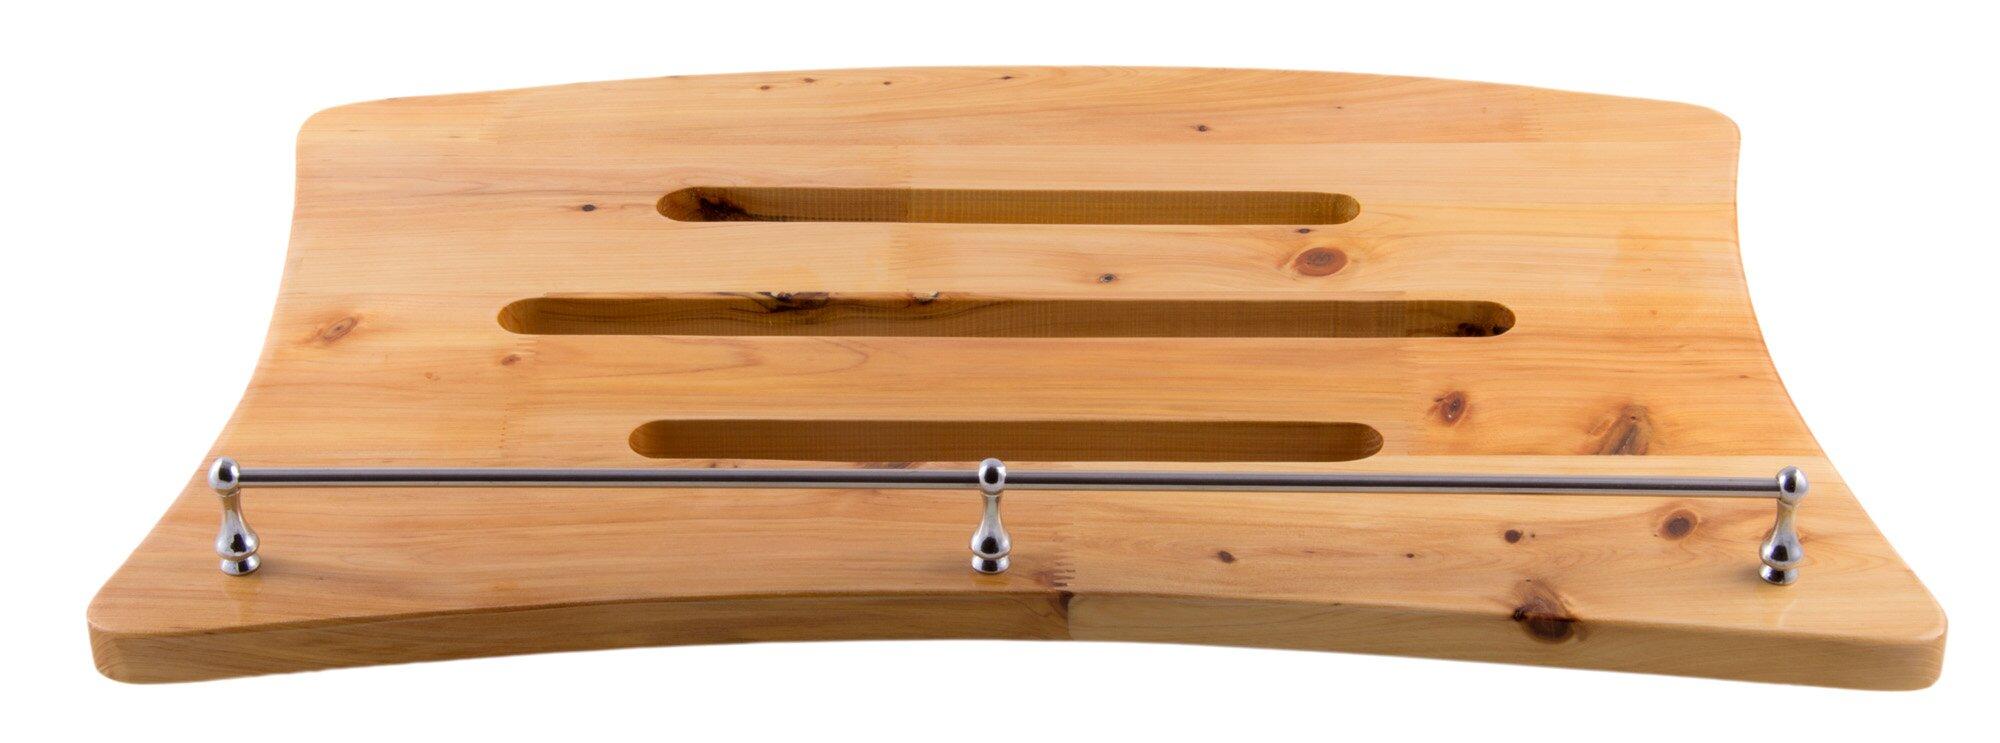 Alfi Brand Wooden Over The Tub Portable Bath Caddy & Reviews | Wayfair